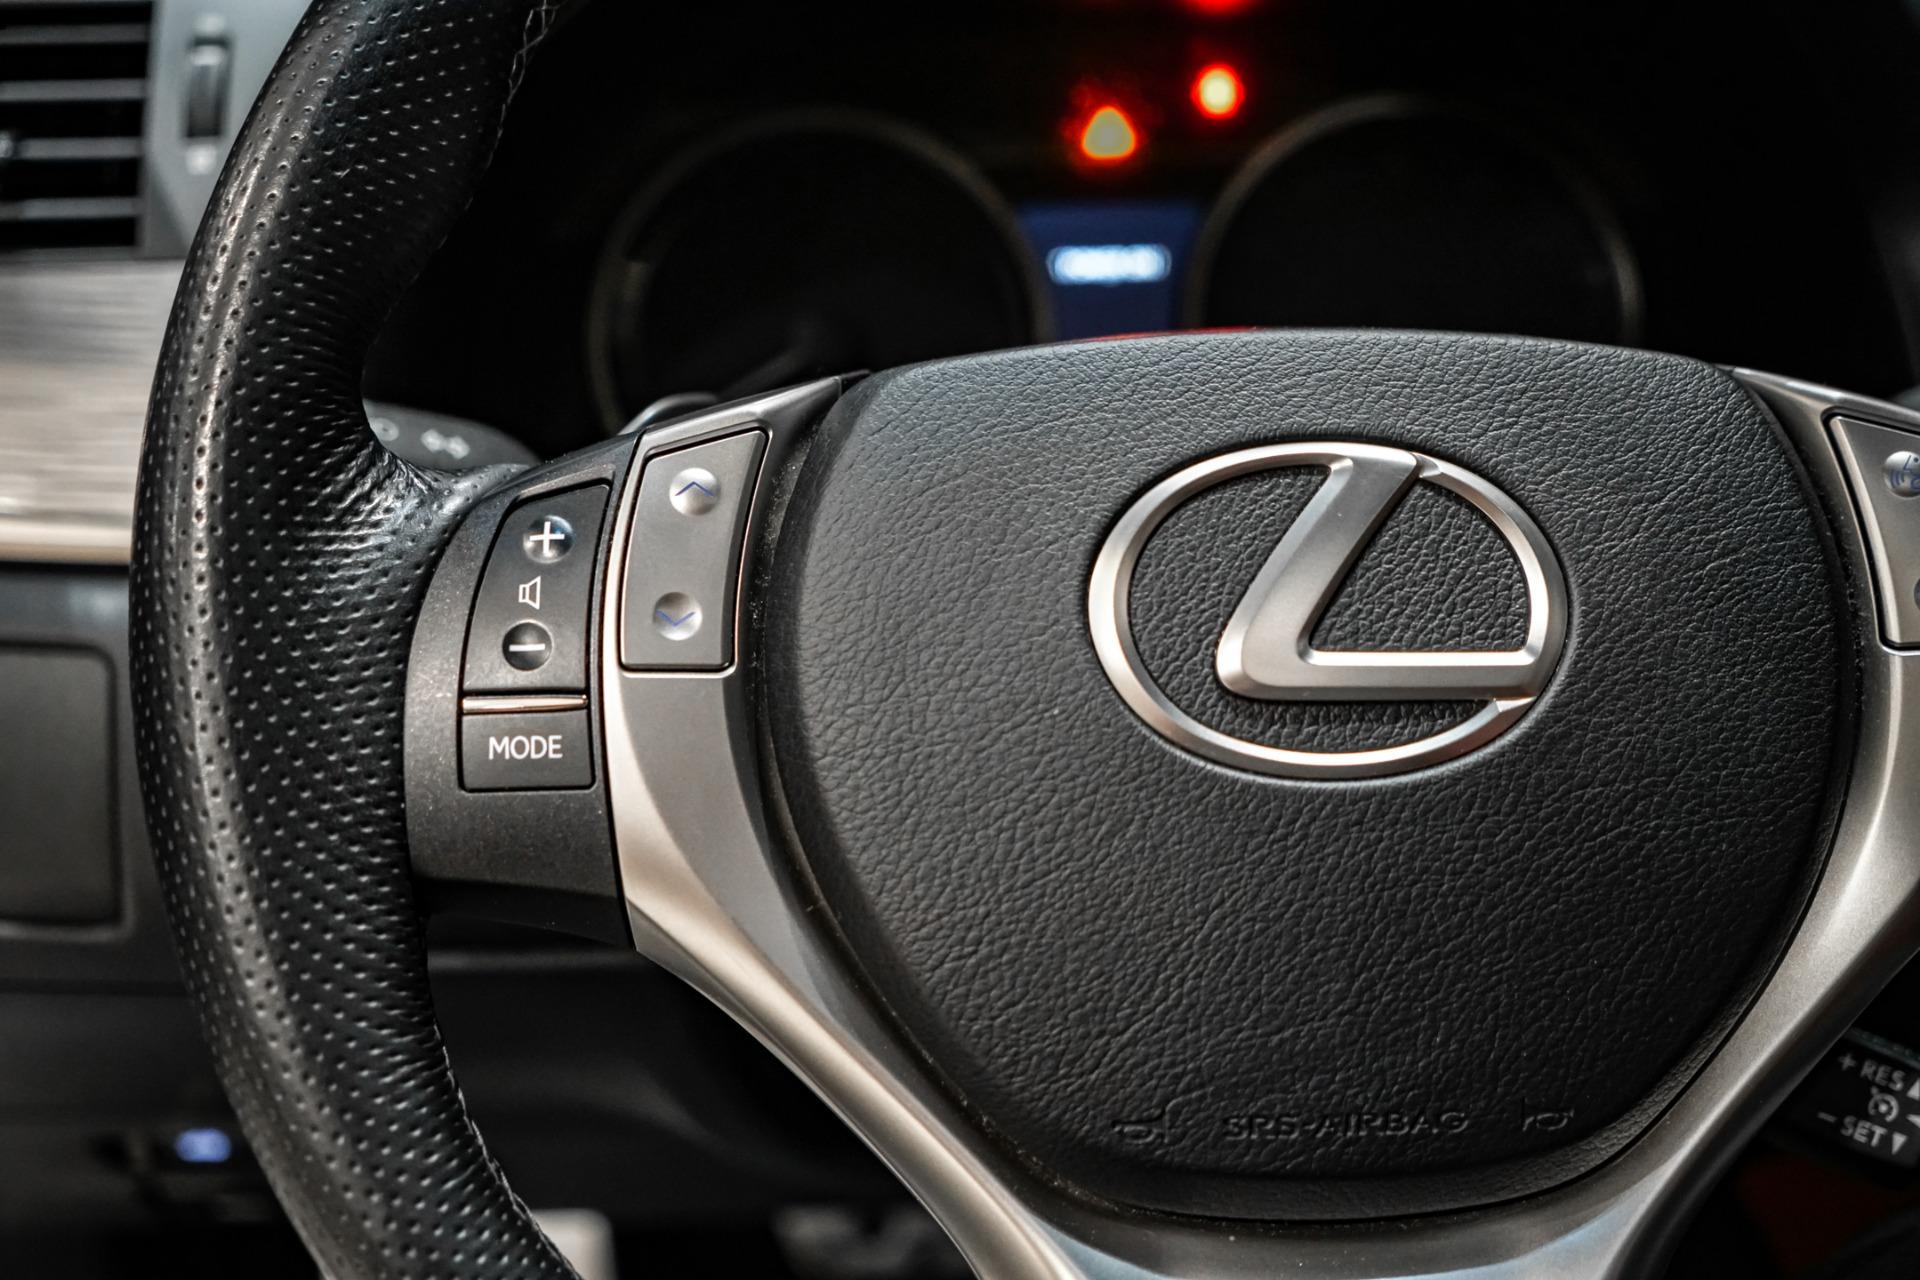 Used 2014 Lexus GS350 F-Sport AWD Sedan For Sale (Special